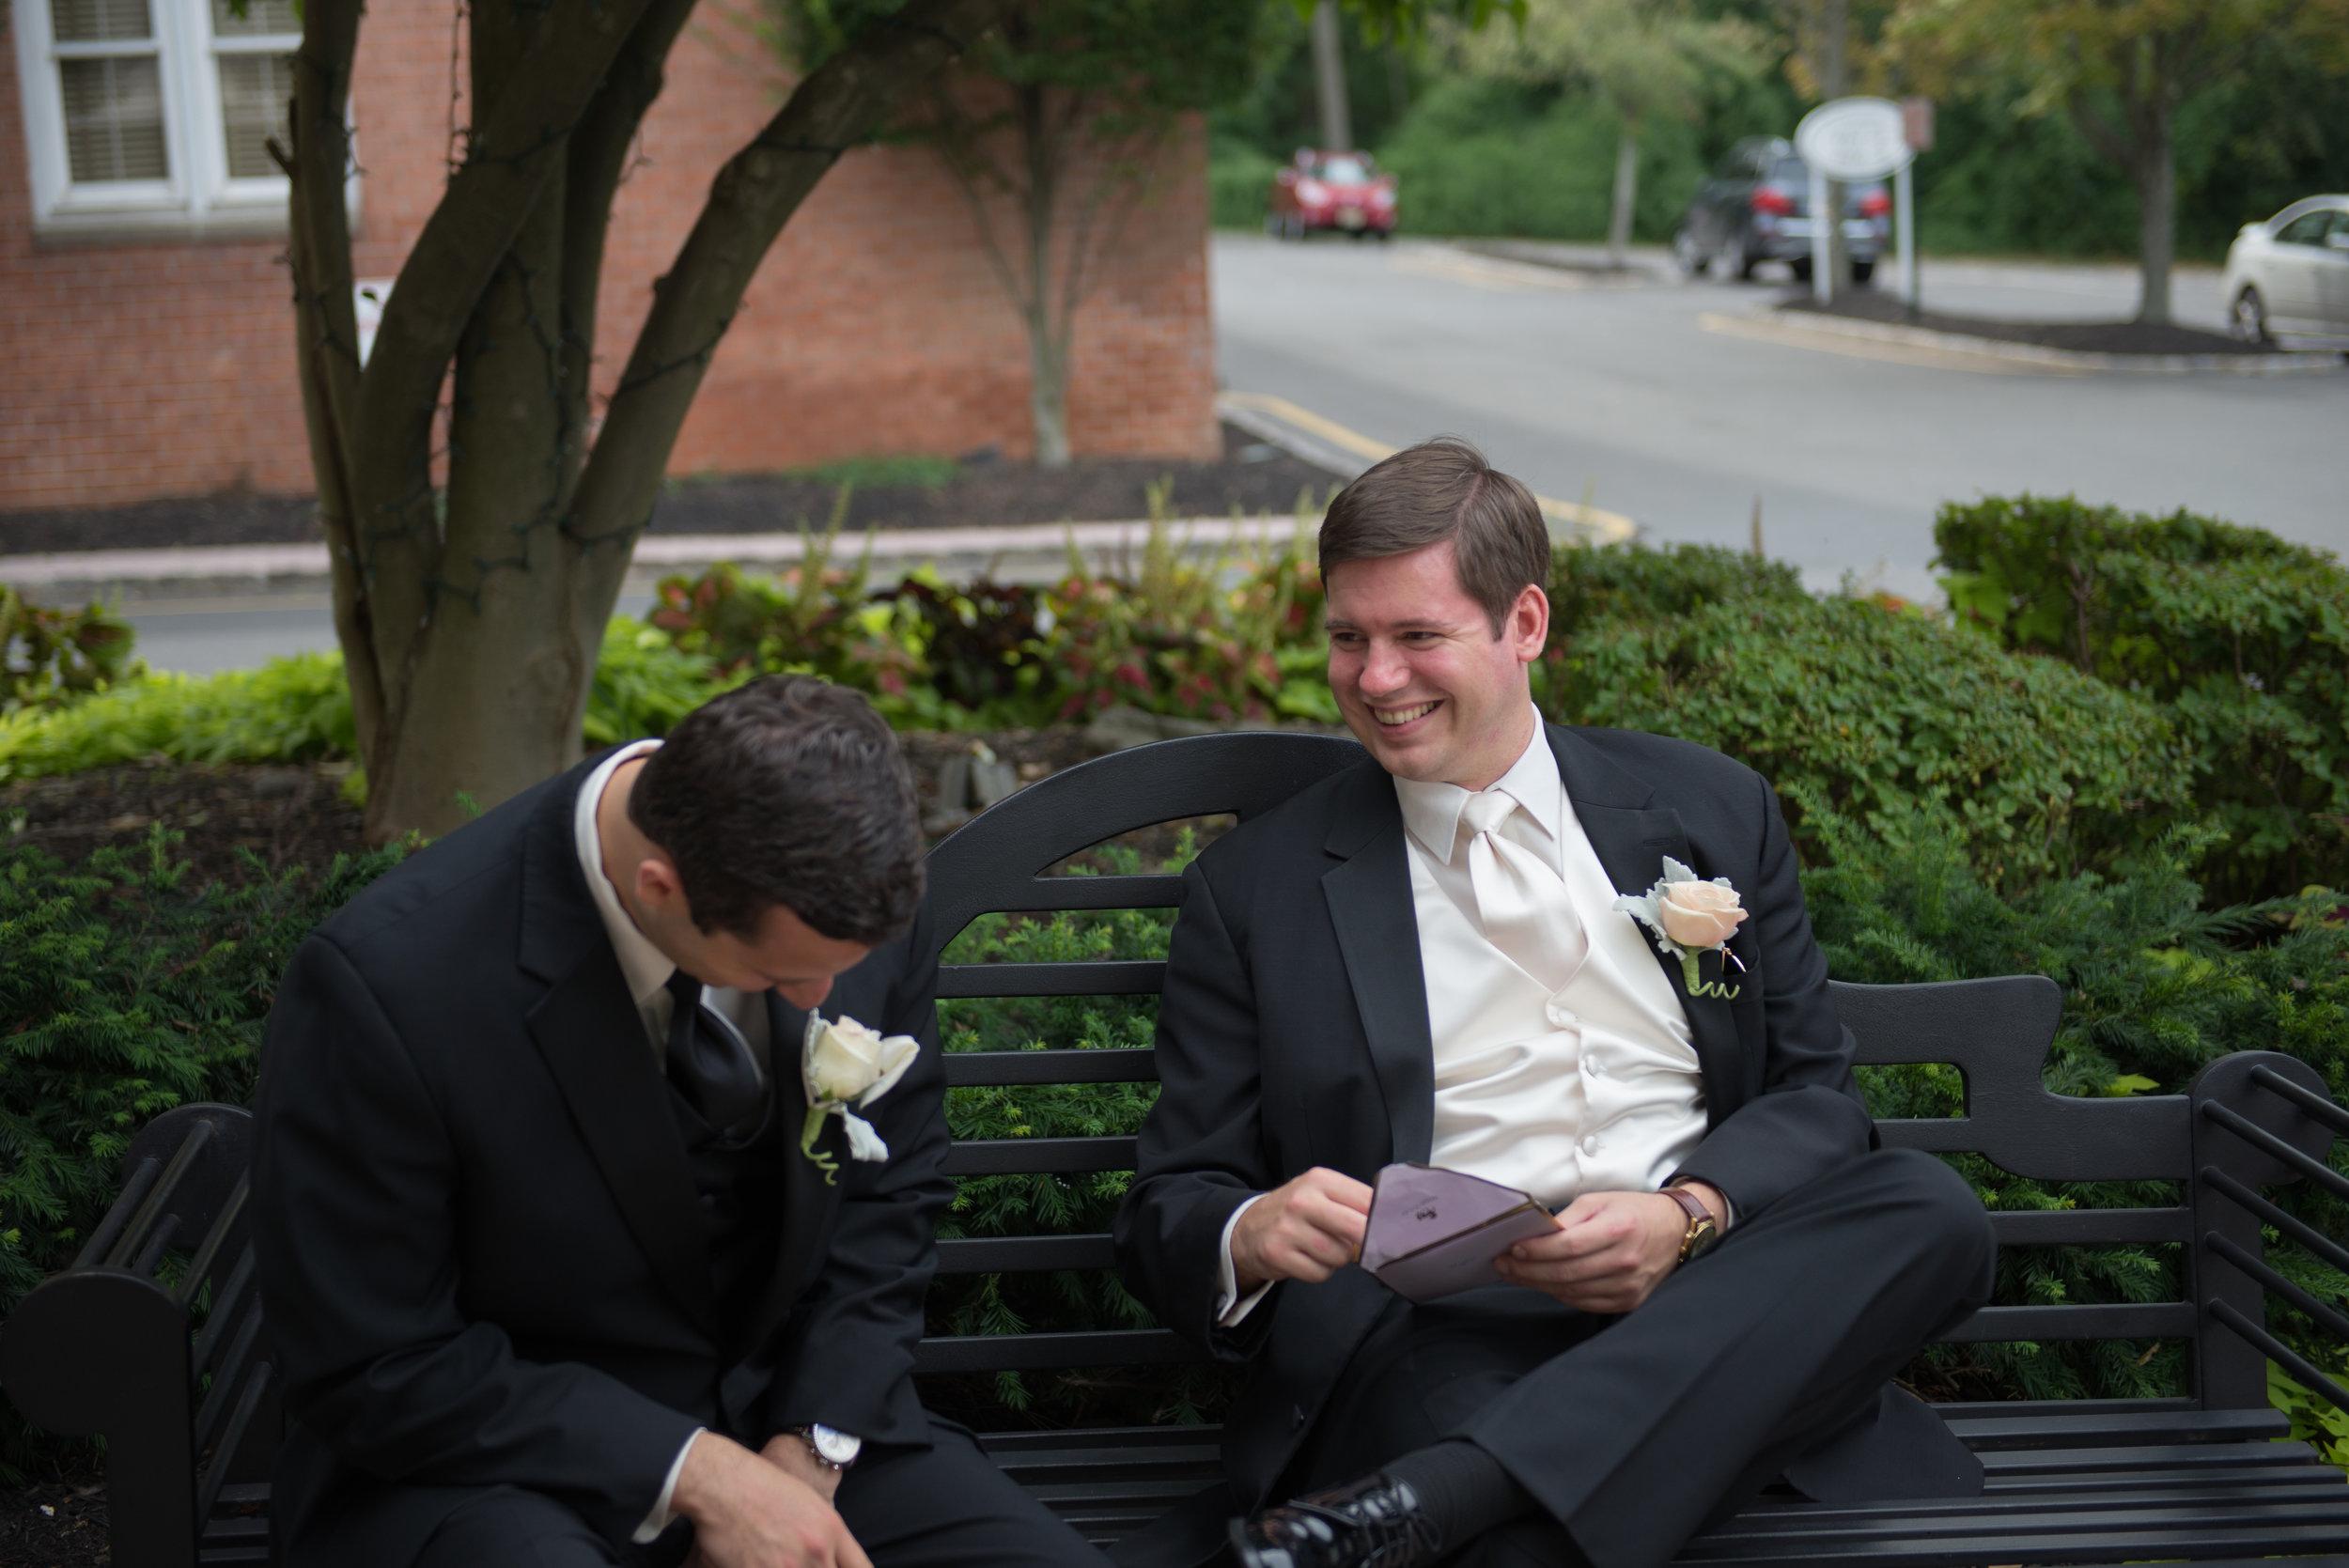 Wedding First Look Photos00892.jpg